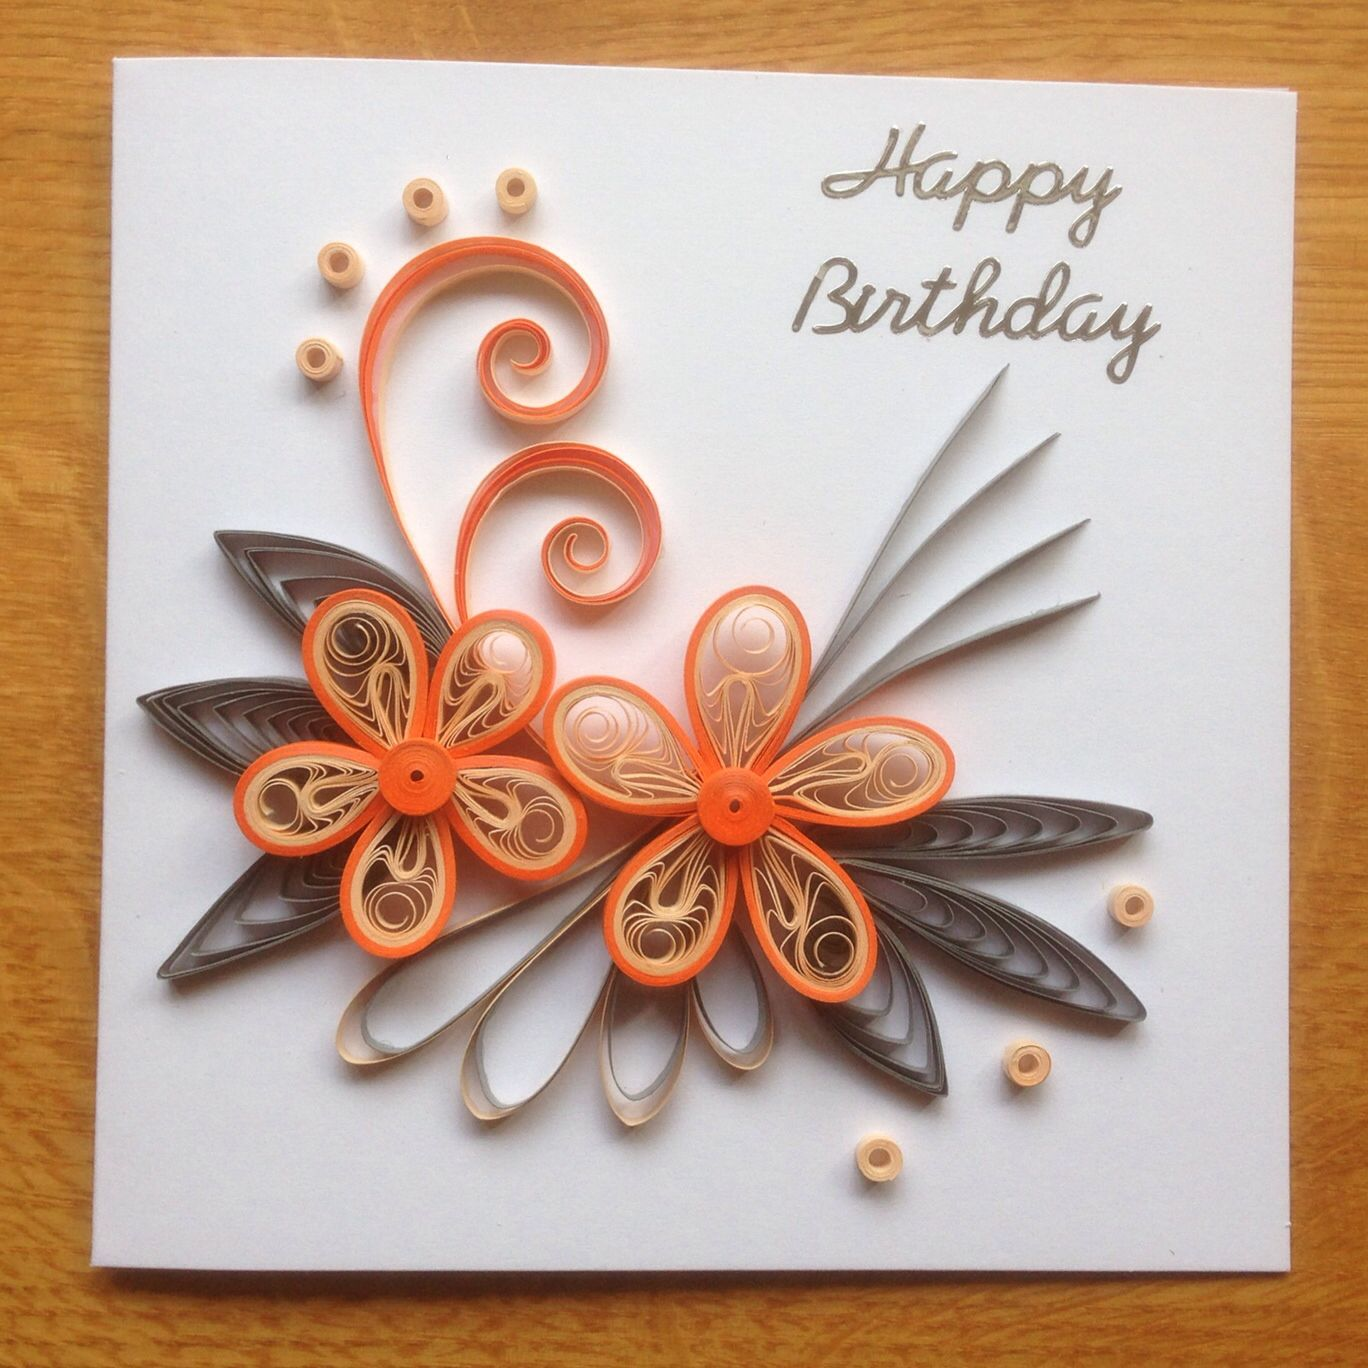 Quilling birthday card orange f dselsdagskort for Quilling designs